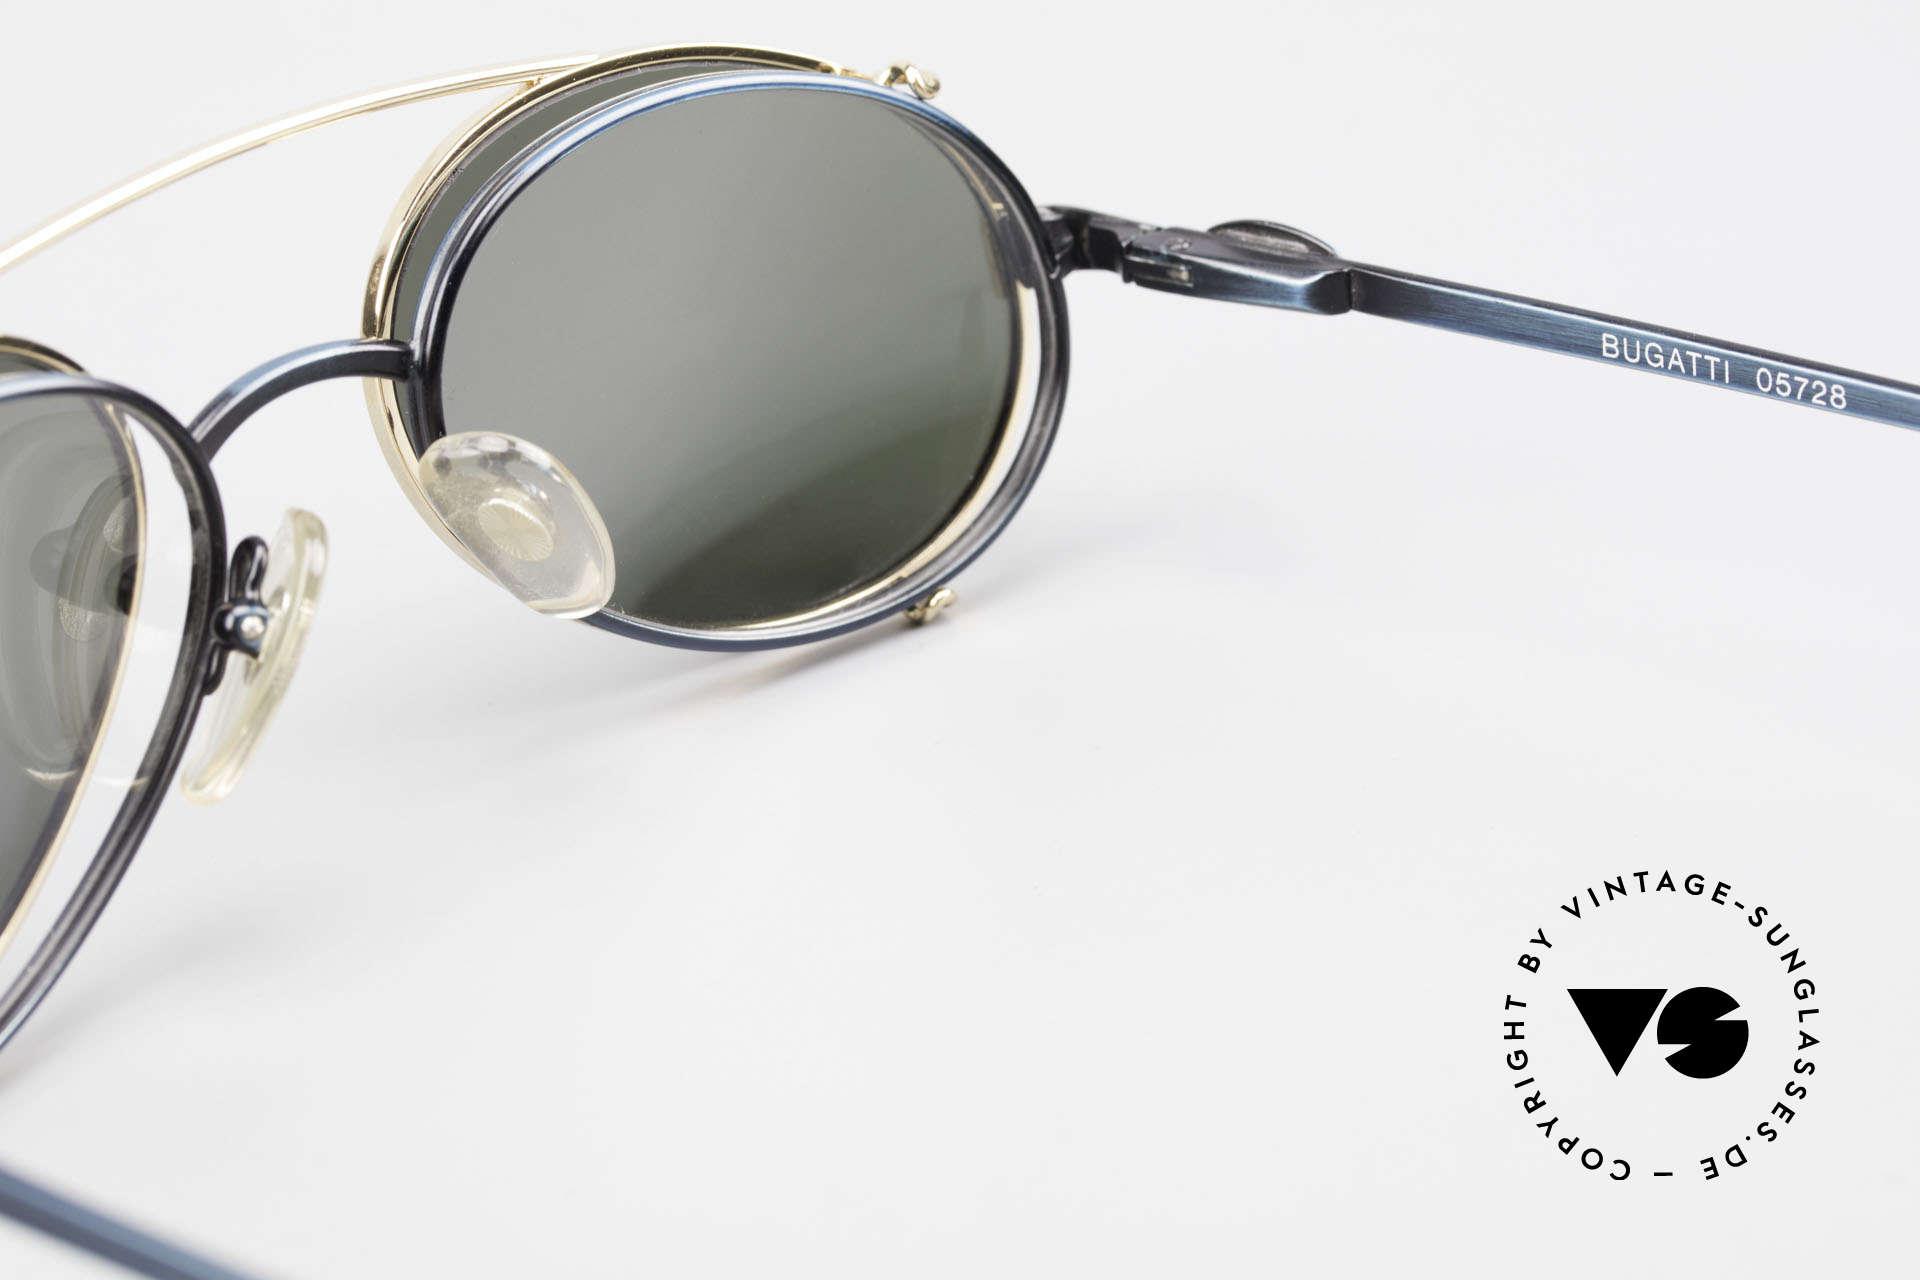 Bugatti 05728 Rare 90's Eyeglasses Clip On, Size: medium, Made for Men